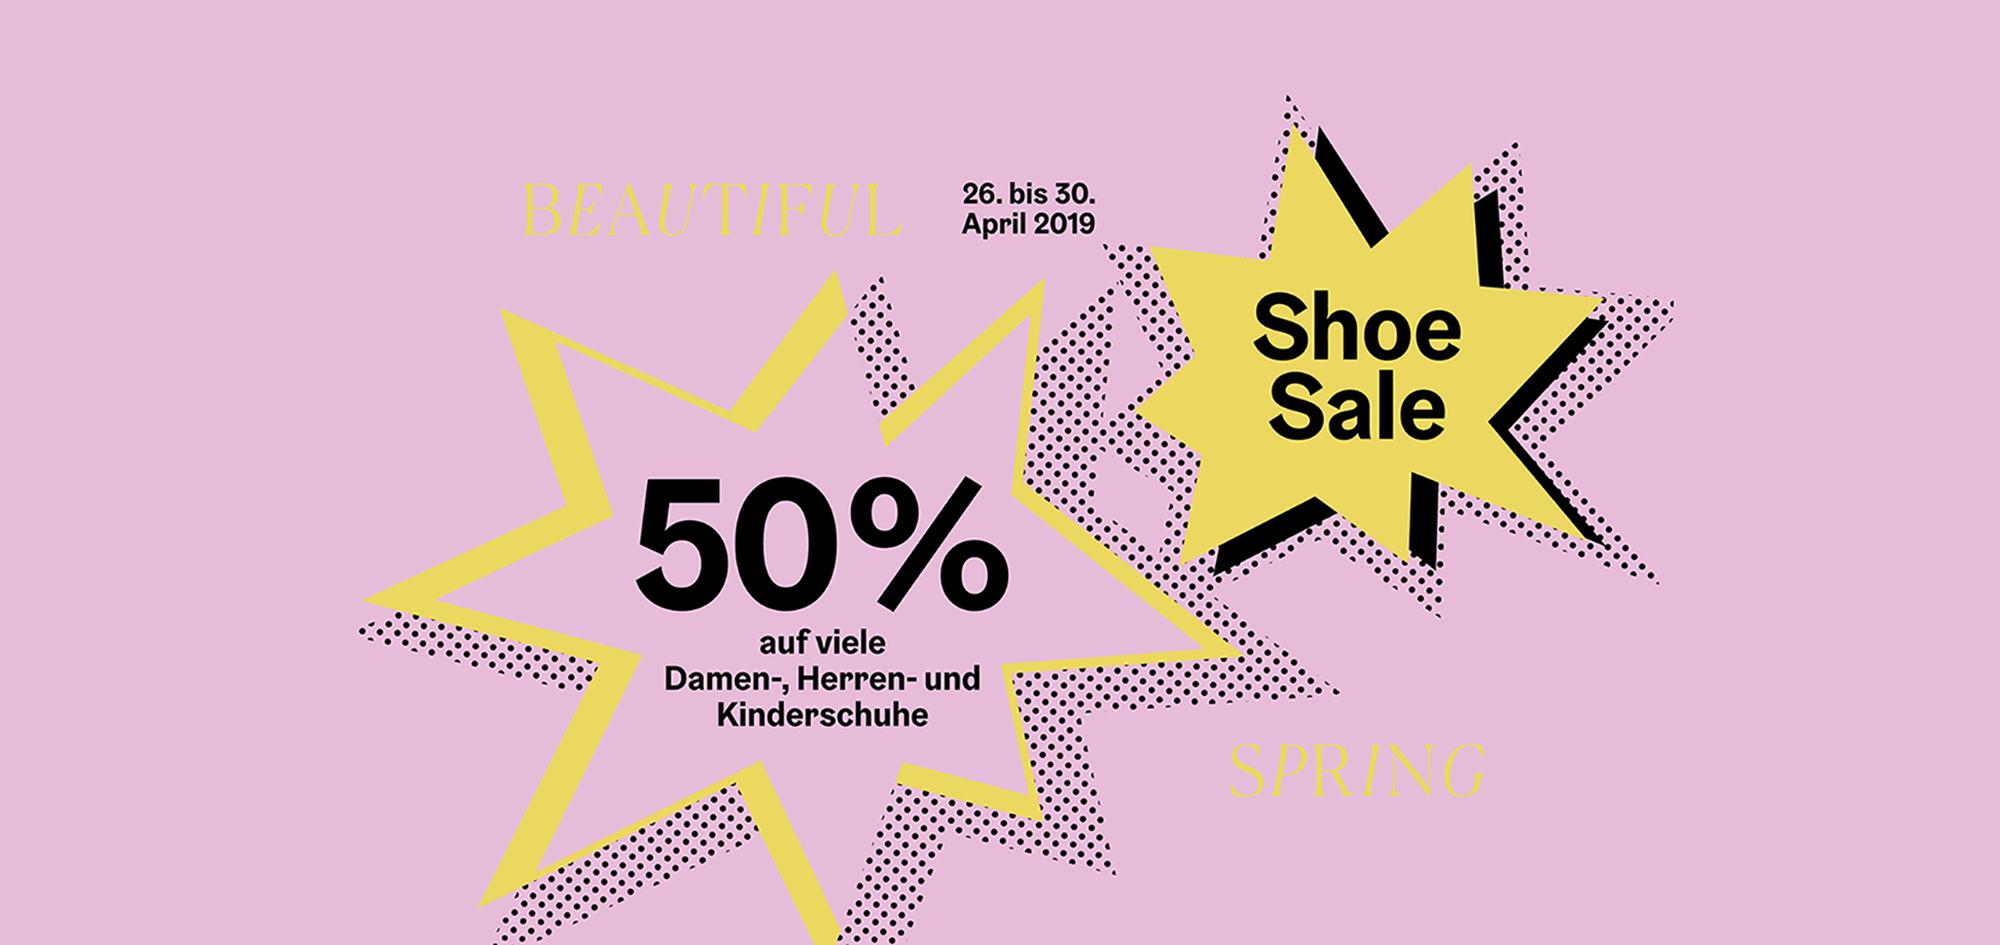 Shoe-Sale-Aktion-Kampagne-50%-off-XL-Teaser-DE_neu